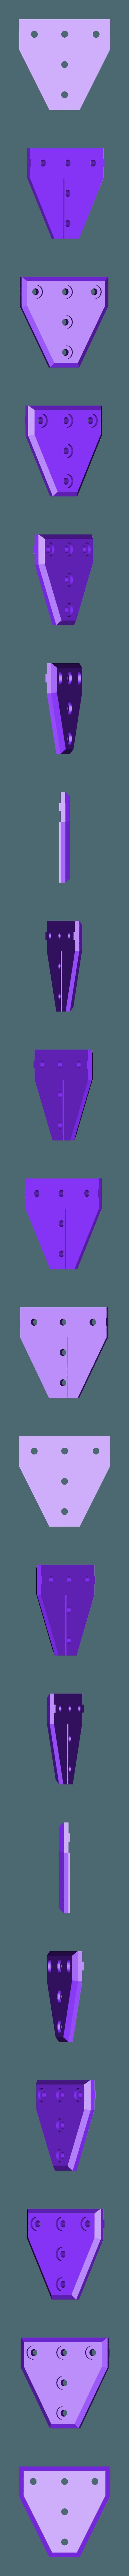 2020_T_Plate_Delta_V2.stl Download free STL file 2020 Profile Aluminum 3D Printable Erector Set • 3D printer model, adamjvr